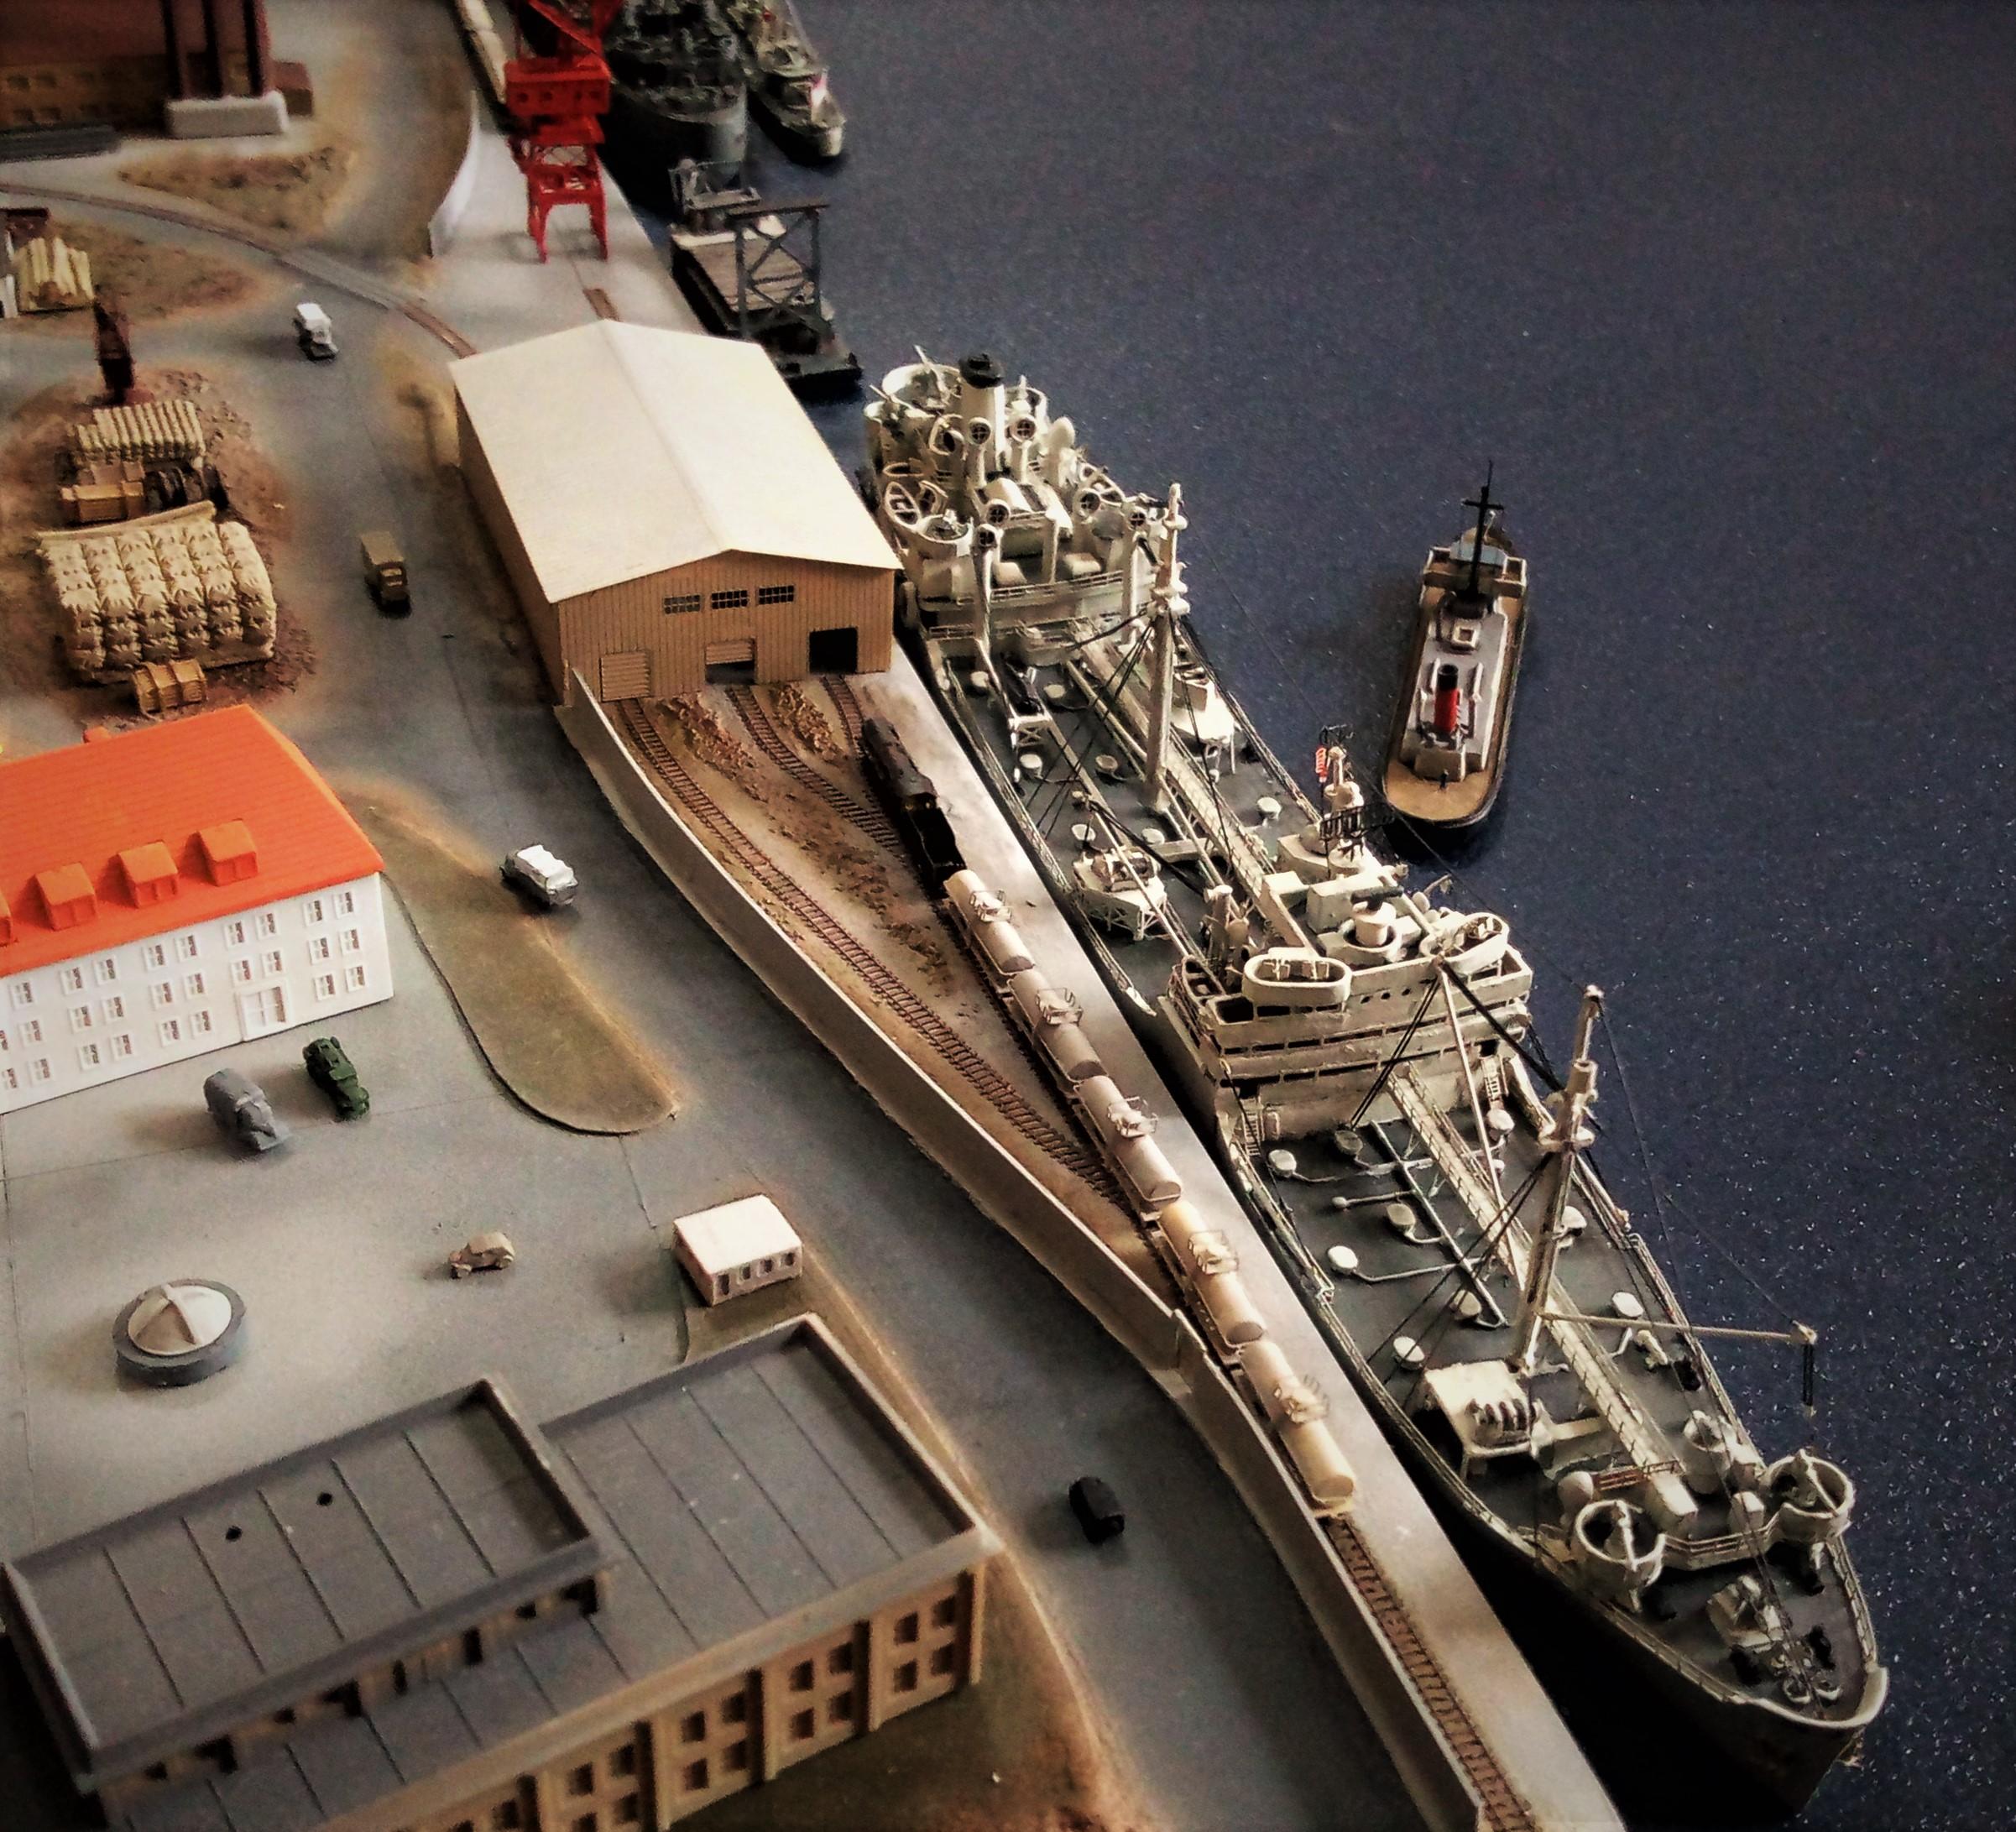 Diorama base navale 1/700 par Nesquik - Page 4 E5qZMo3wA